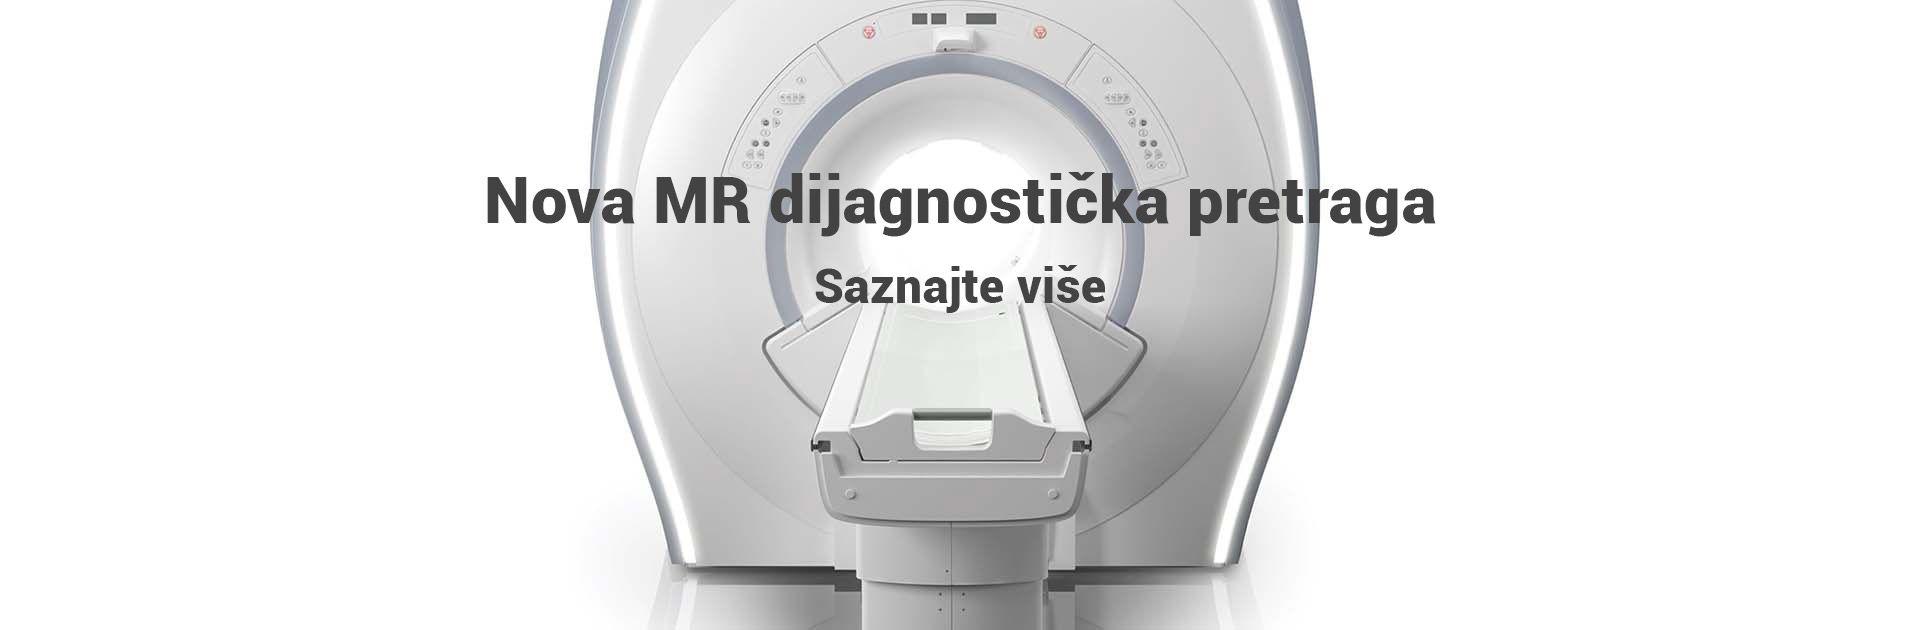 radiologija poliklinika drinkovic mr dijagnoza akcija